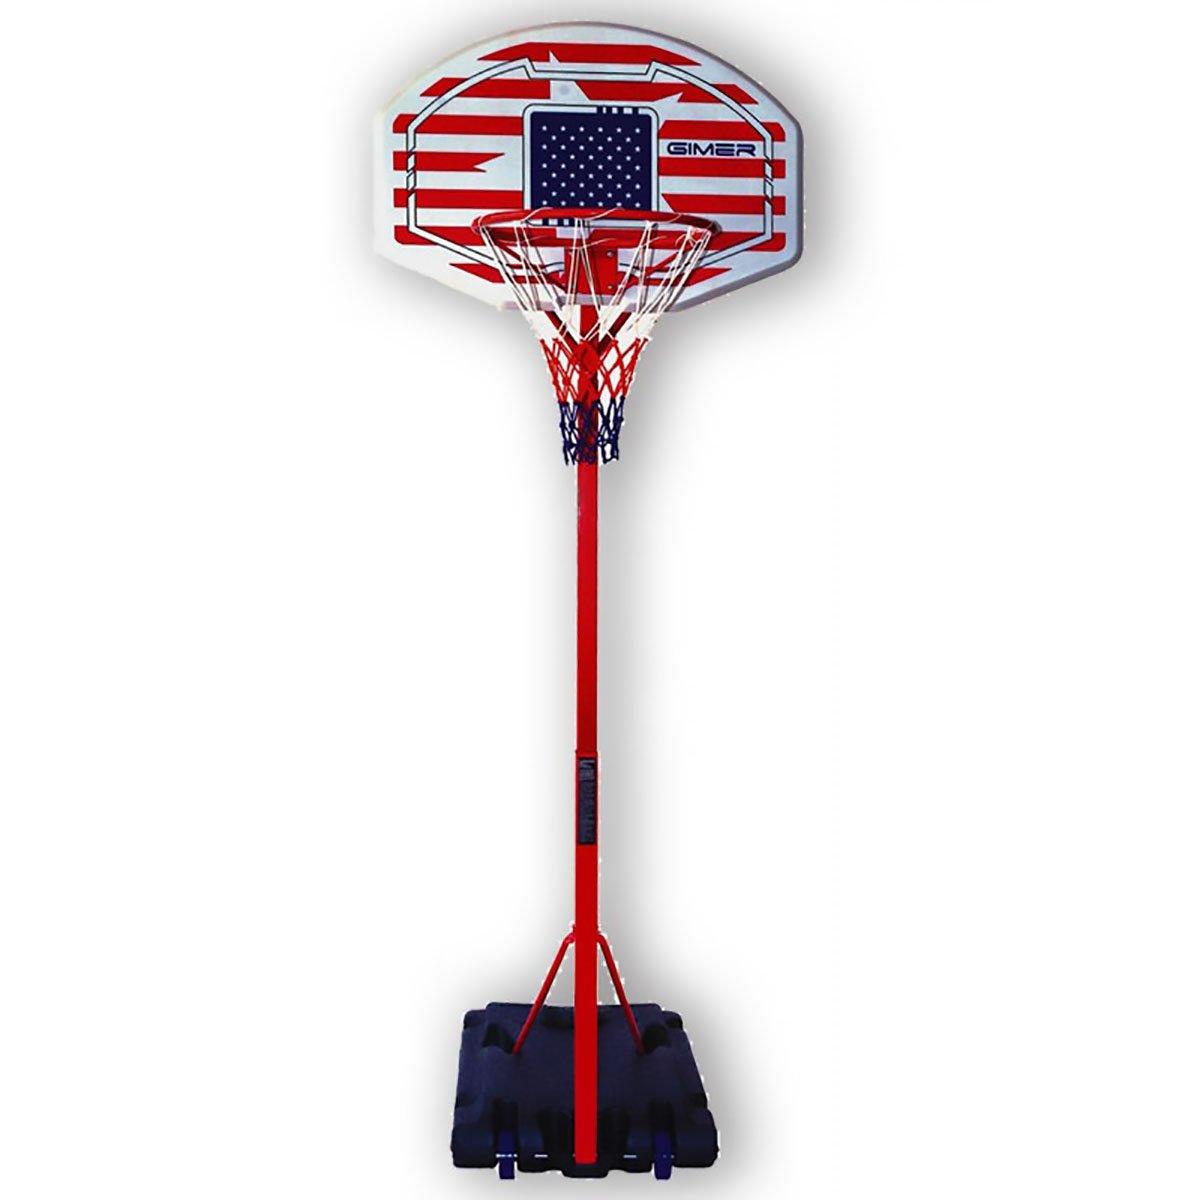 GIMER 10/540 September ADULT BASKETBALL BASKETBALL BASKETBALL MOBILE STRUCTURE